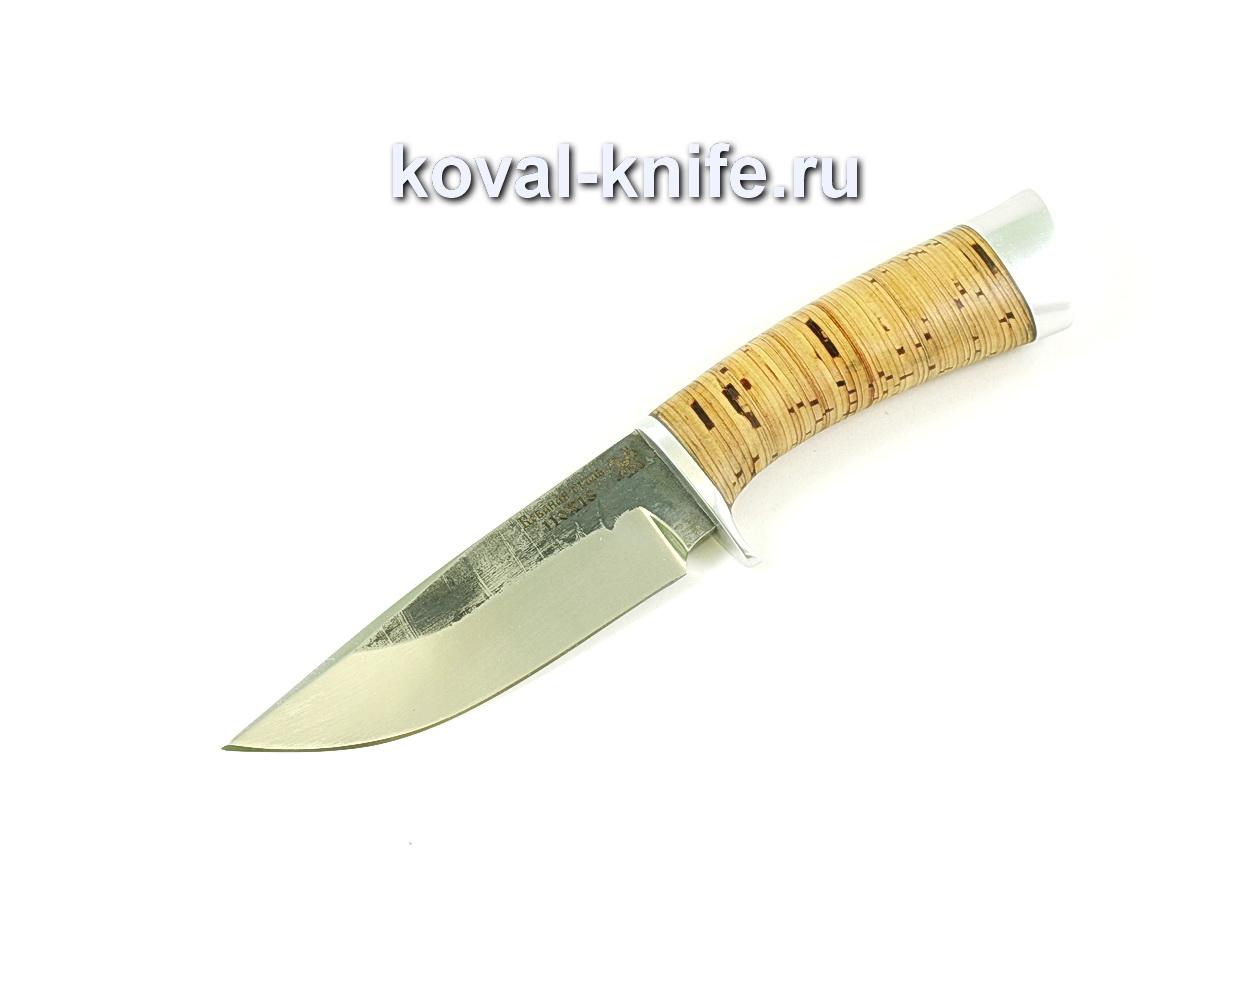 Нож Норвег (сталь 110х18), рукоять береста A038